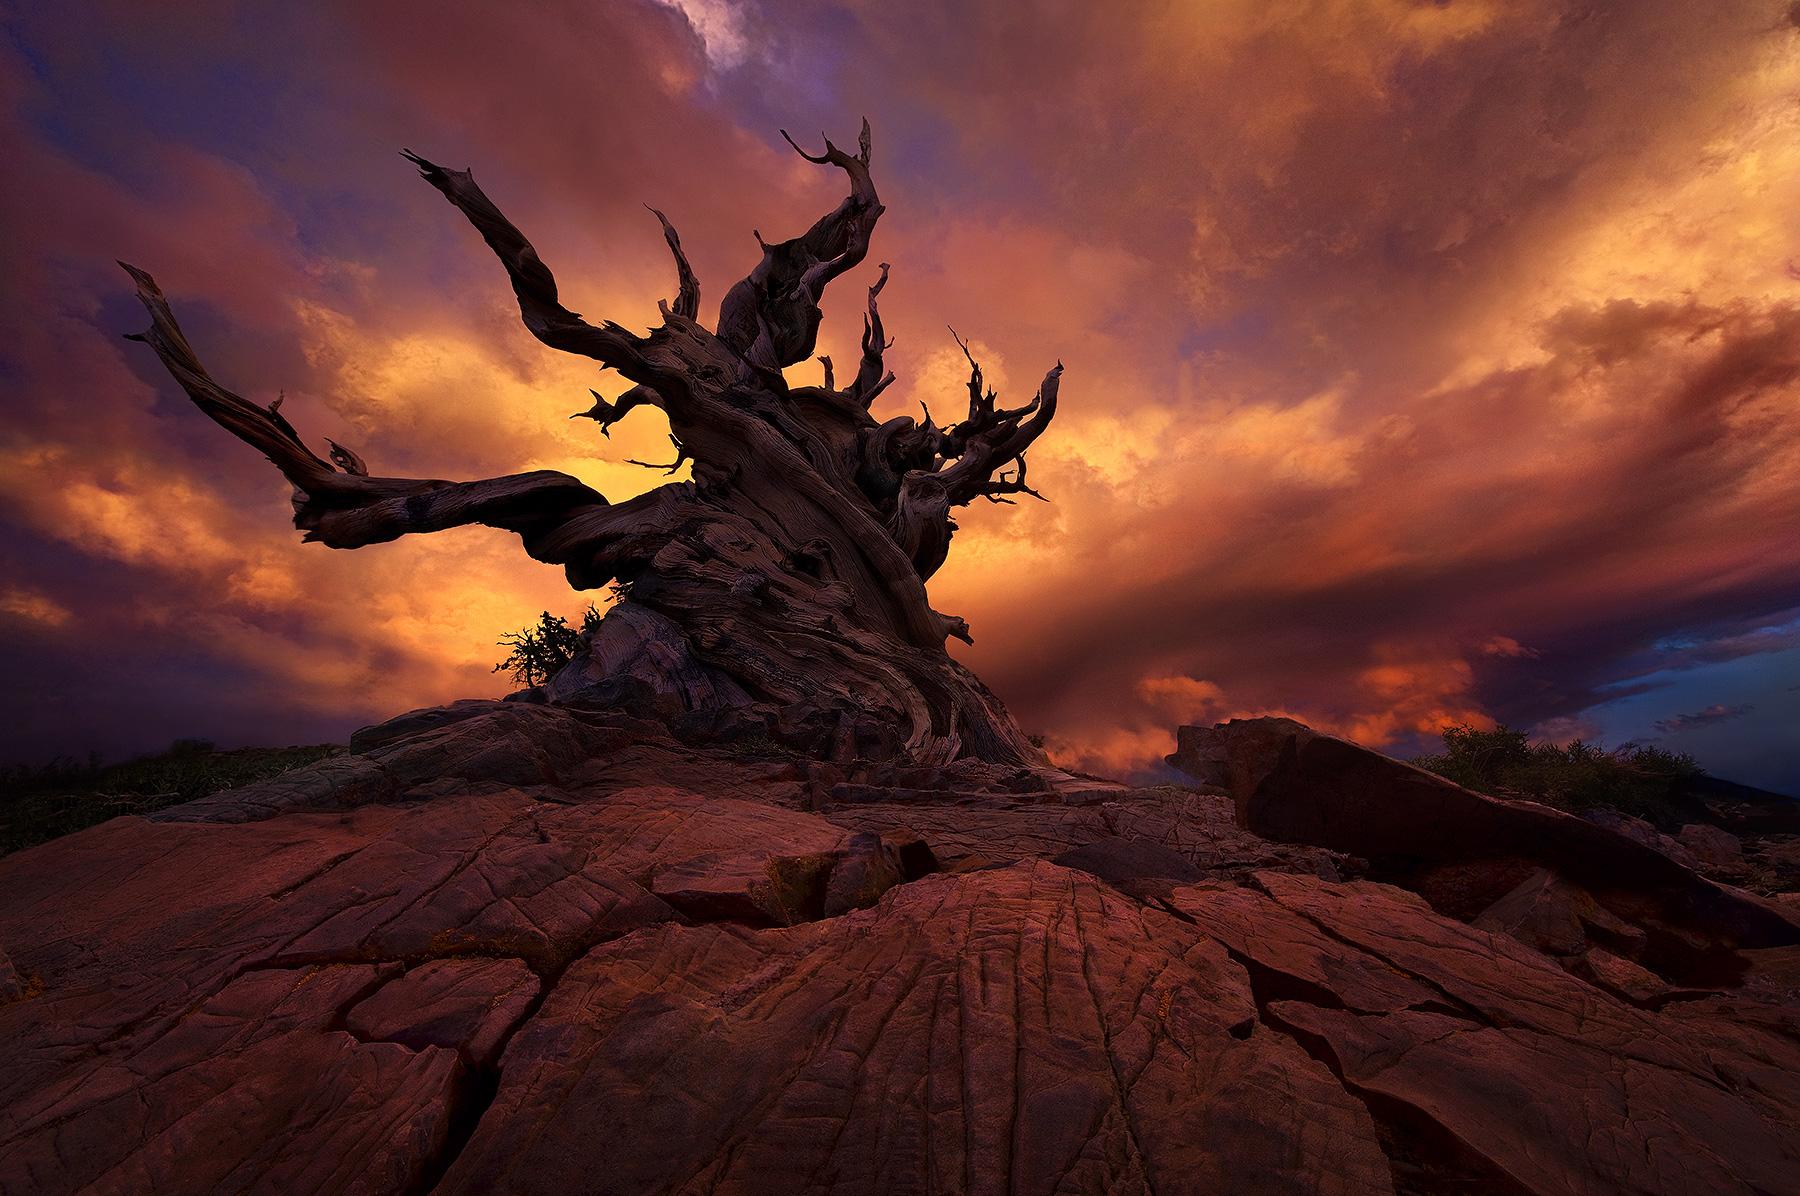 Sunset, Bristlecone, Gnarled, Old, Pine, Tree, Oldest, photo